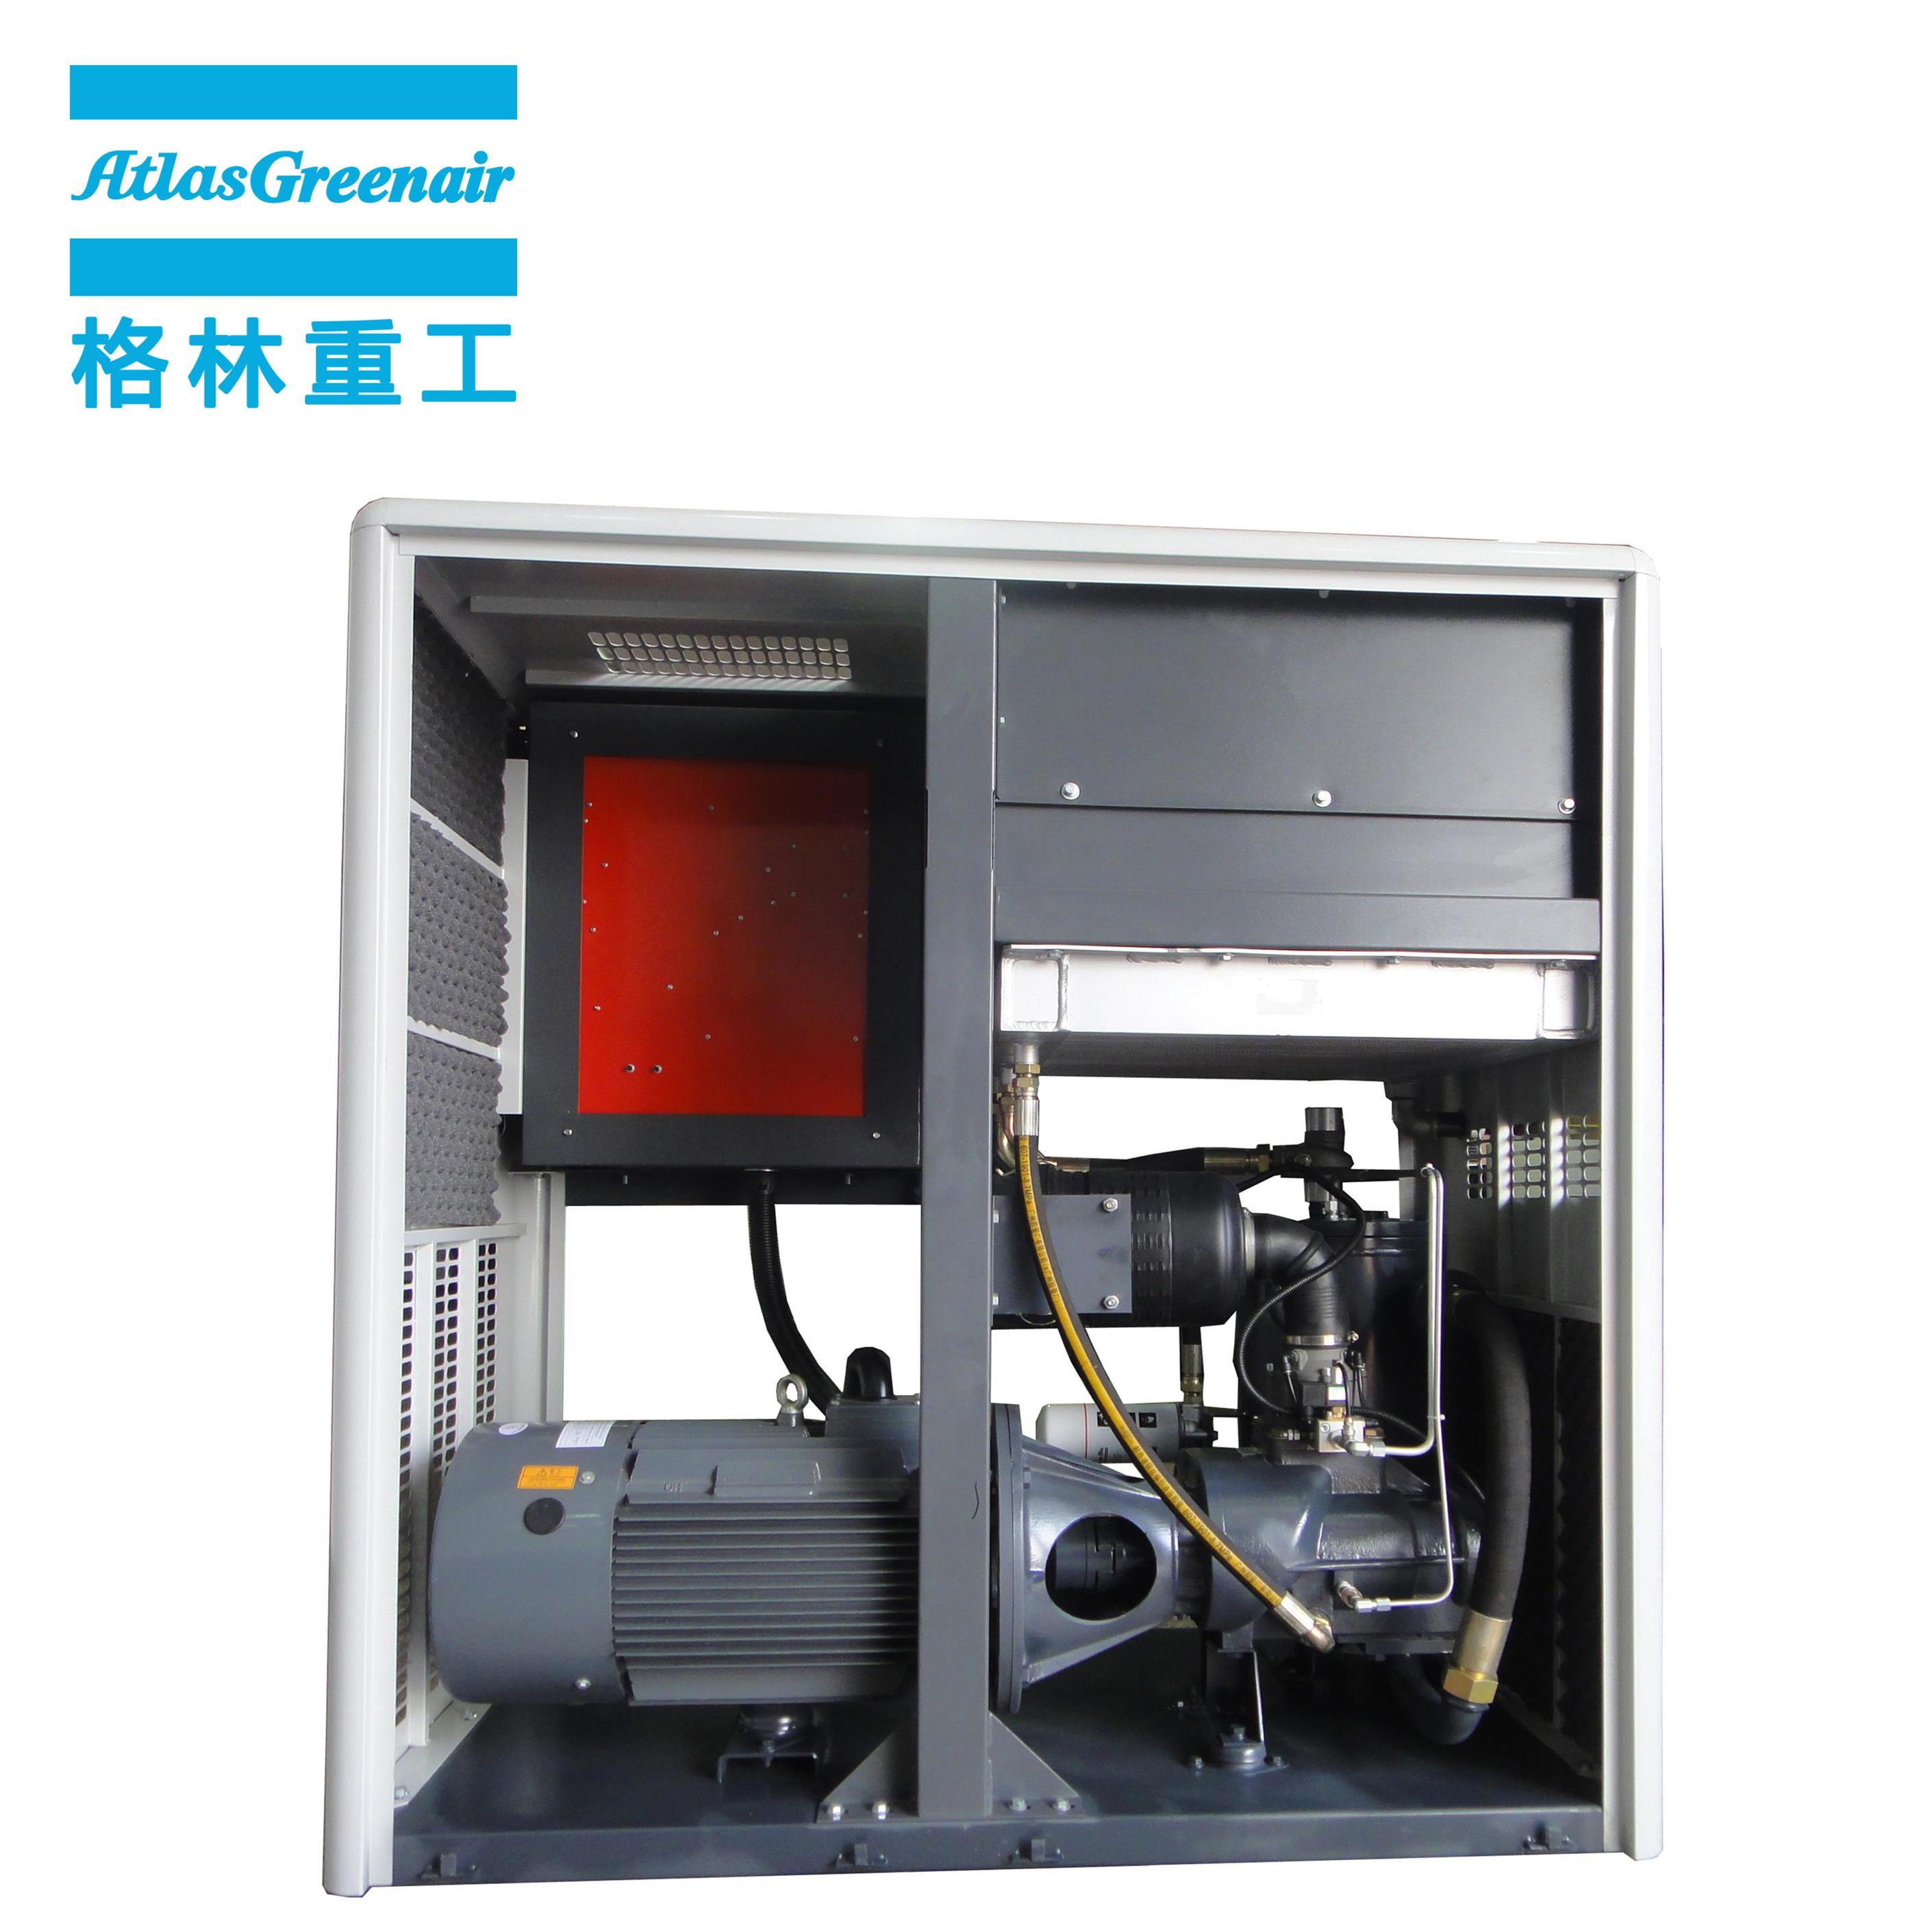 ga atlas copco screw compressor factory for tropical area-2